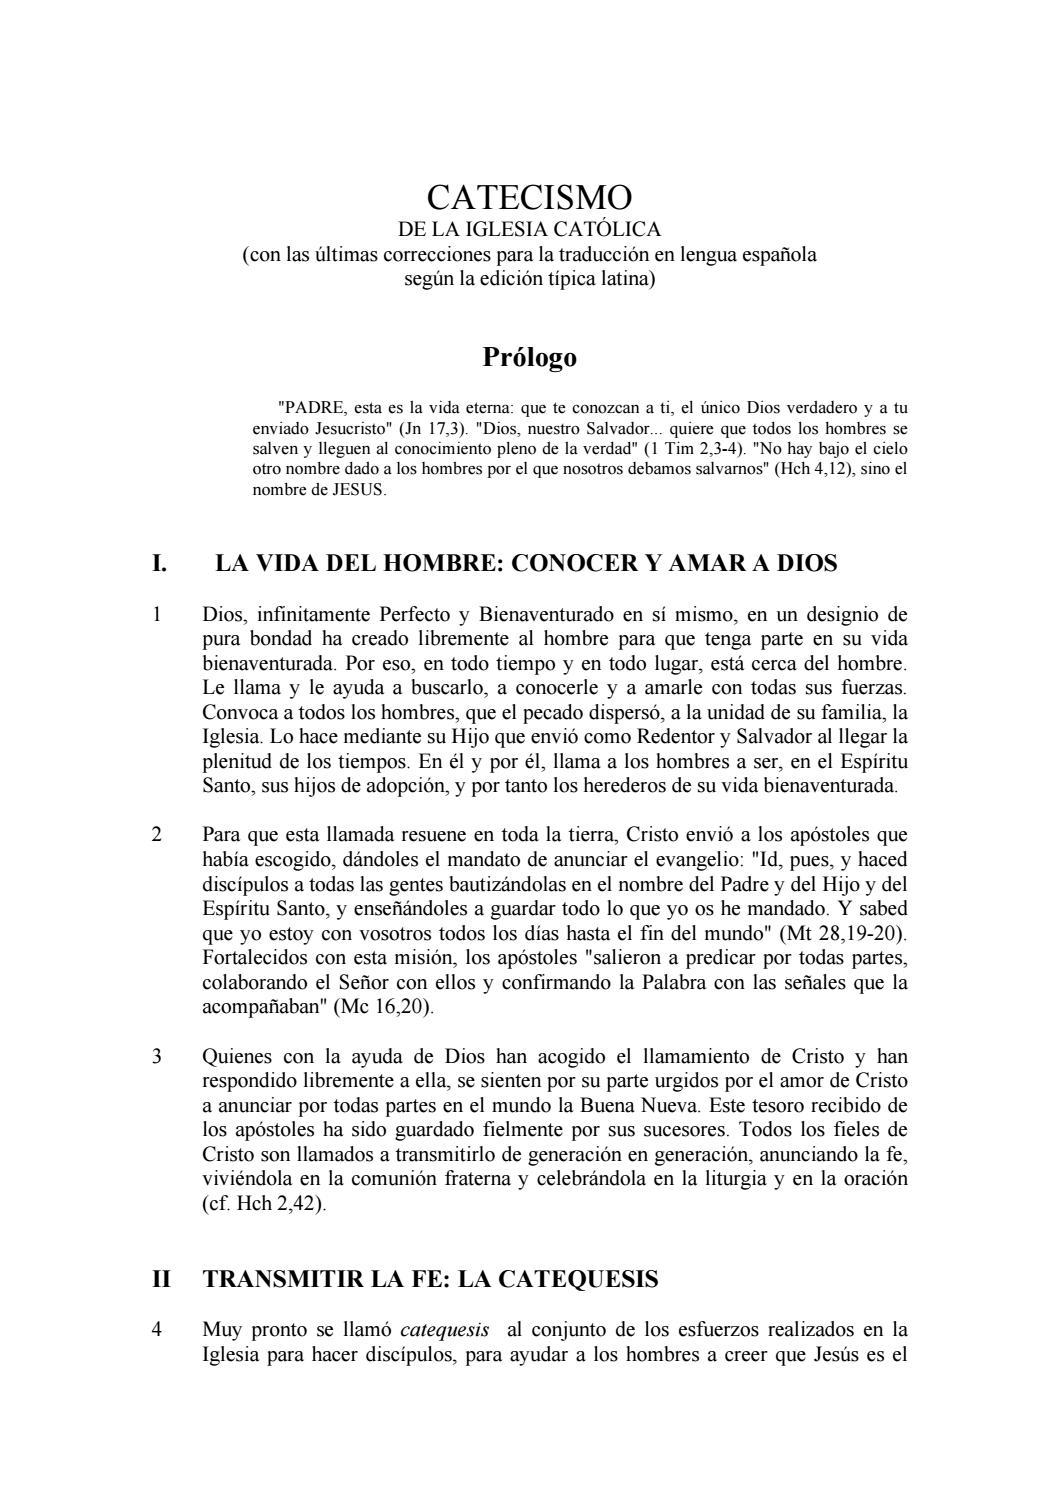 Catecismo De La Iglesia Catolica By Hector Emiro Diaz Velasquez Issuu